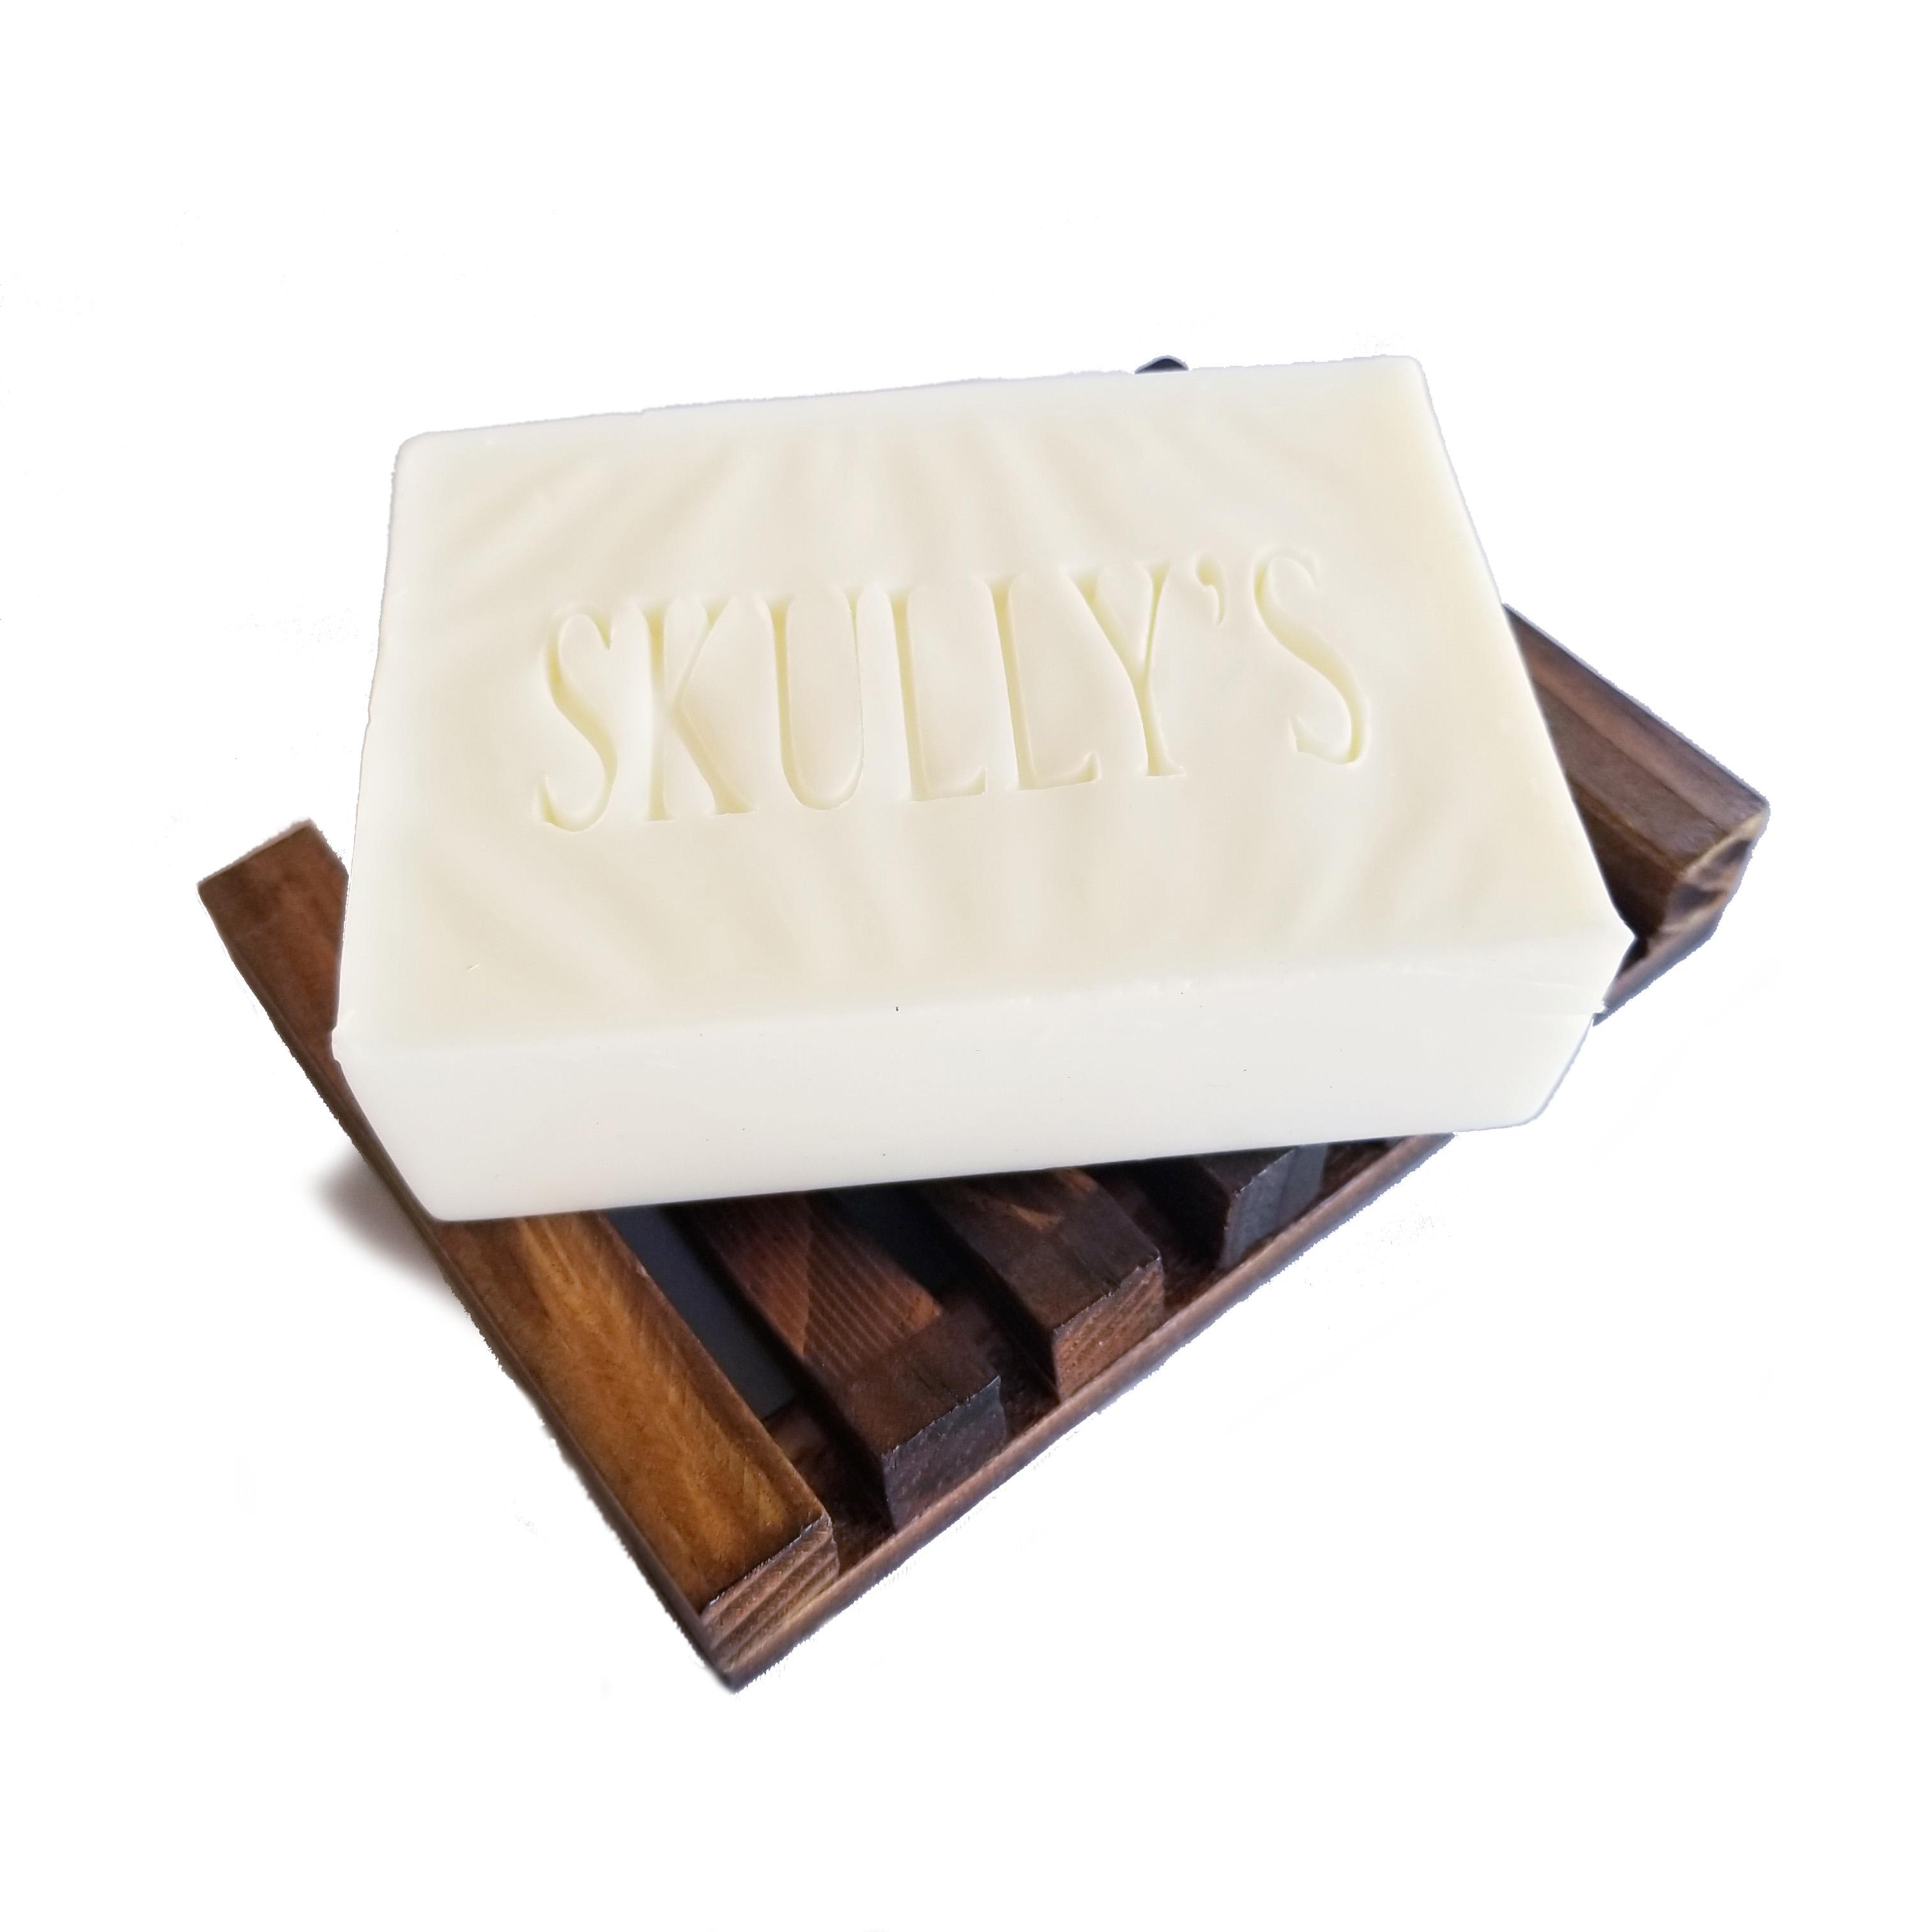 Goats milk soap, unscented, beard soap, by Skully's beard oil